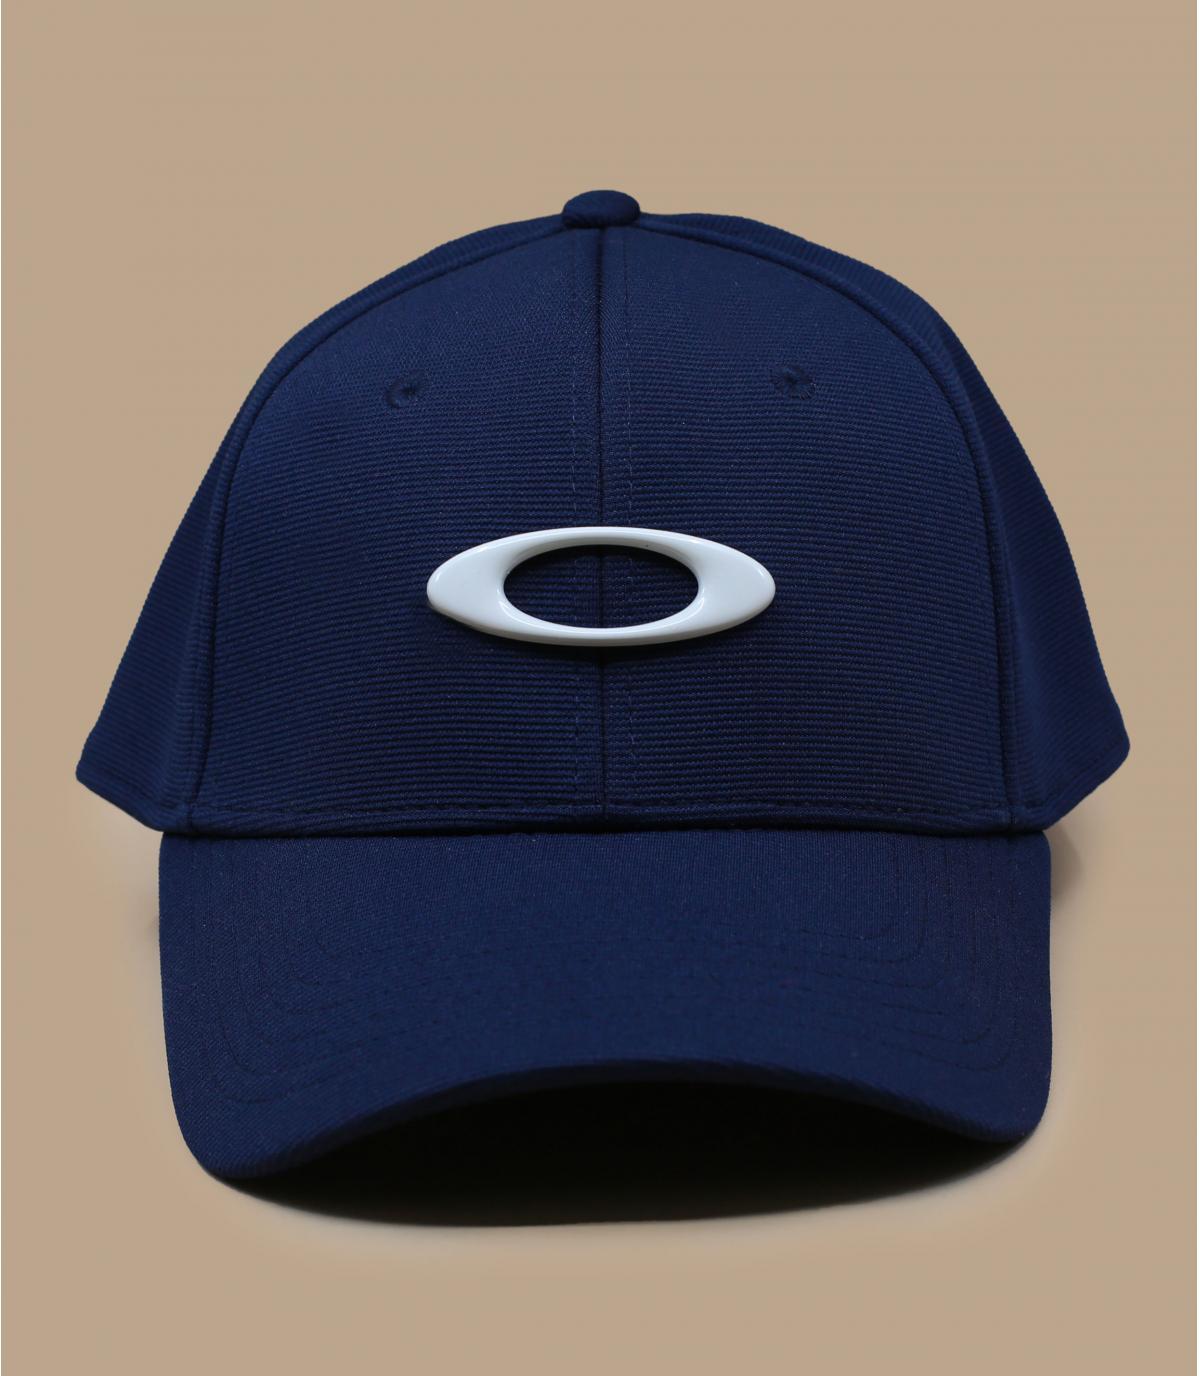 Oakley marineblauwe pet